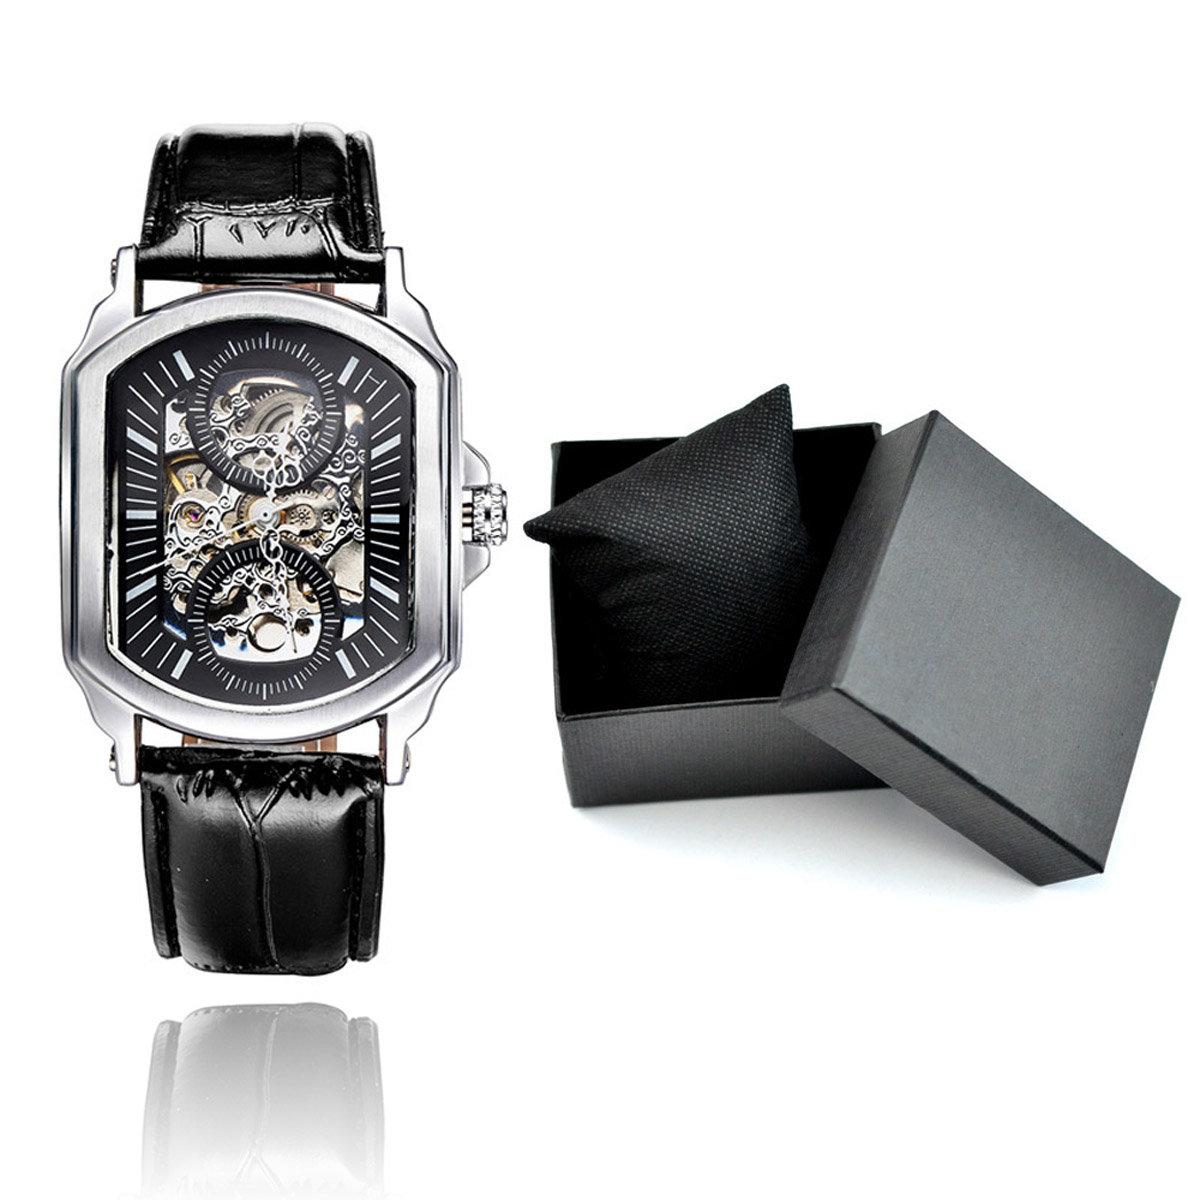 Обзоры на black cloak skeleton, nk brand watches, victorinox watches black, binger date black и часы, деловые часы, спортивные часы, женские часы на aliexpress.